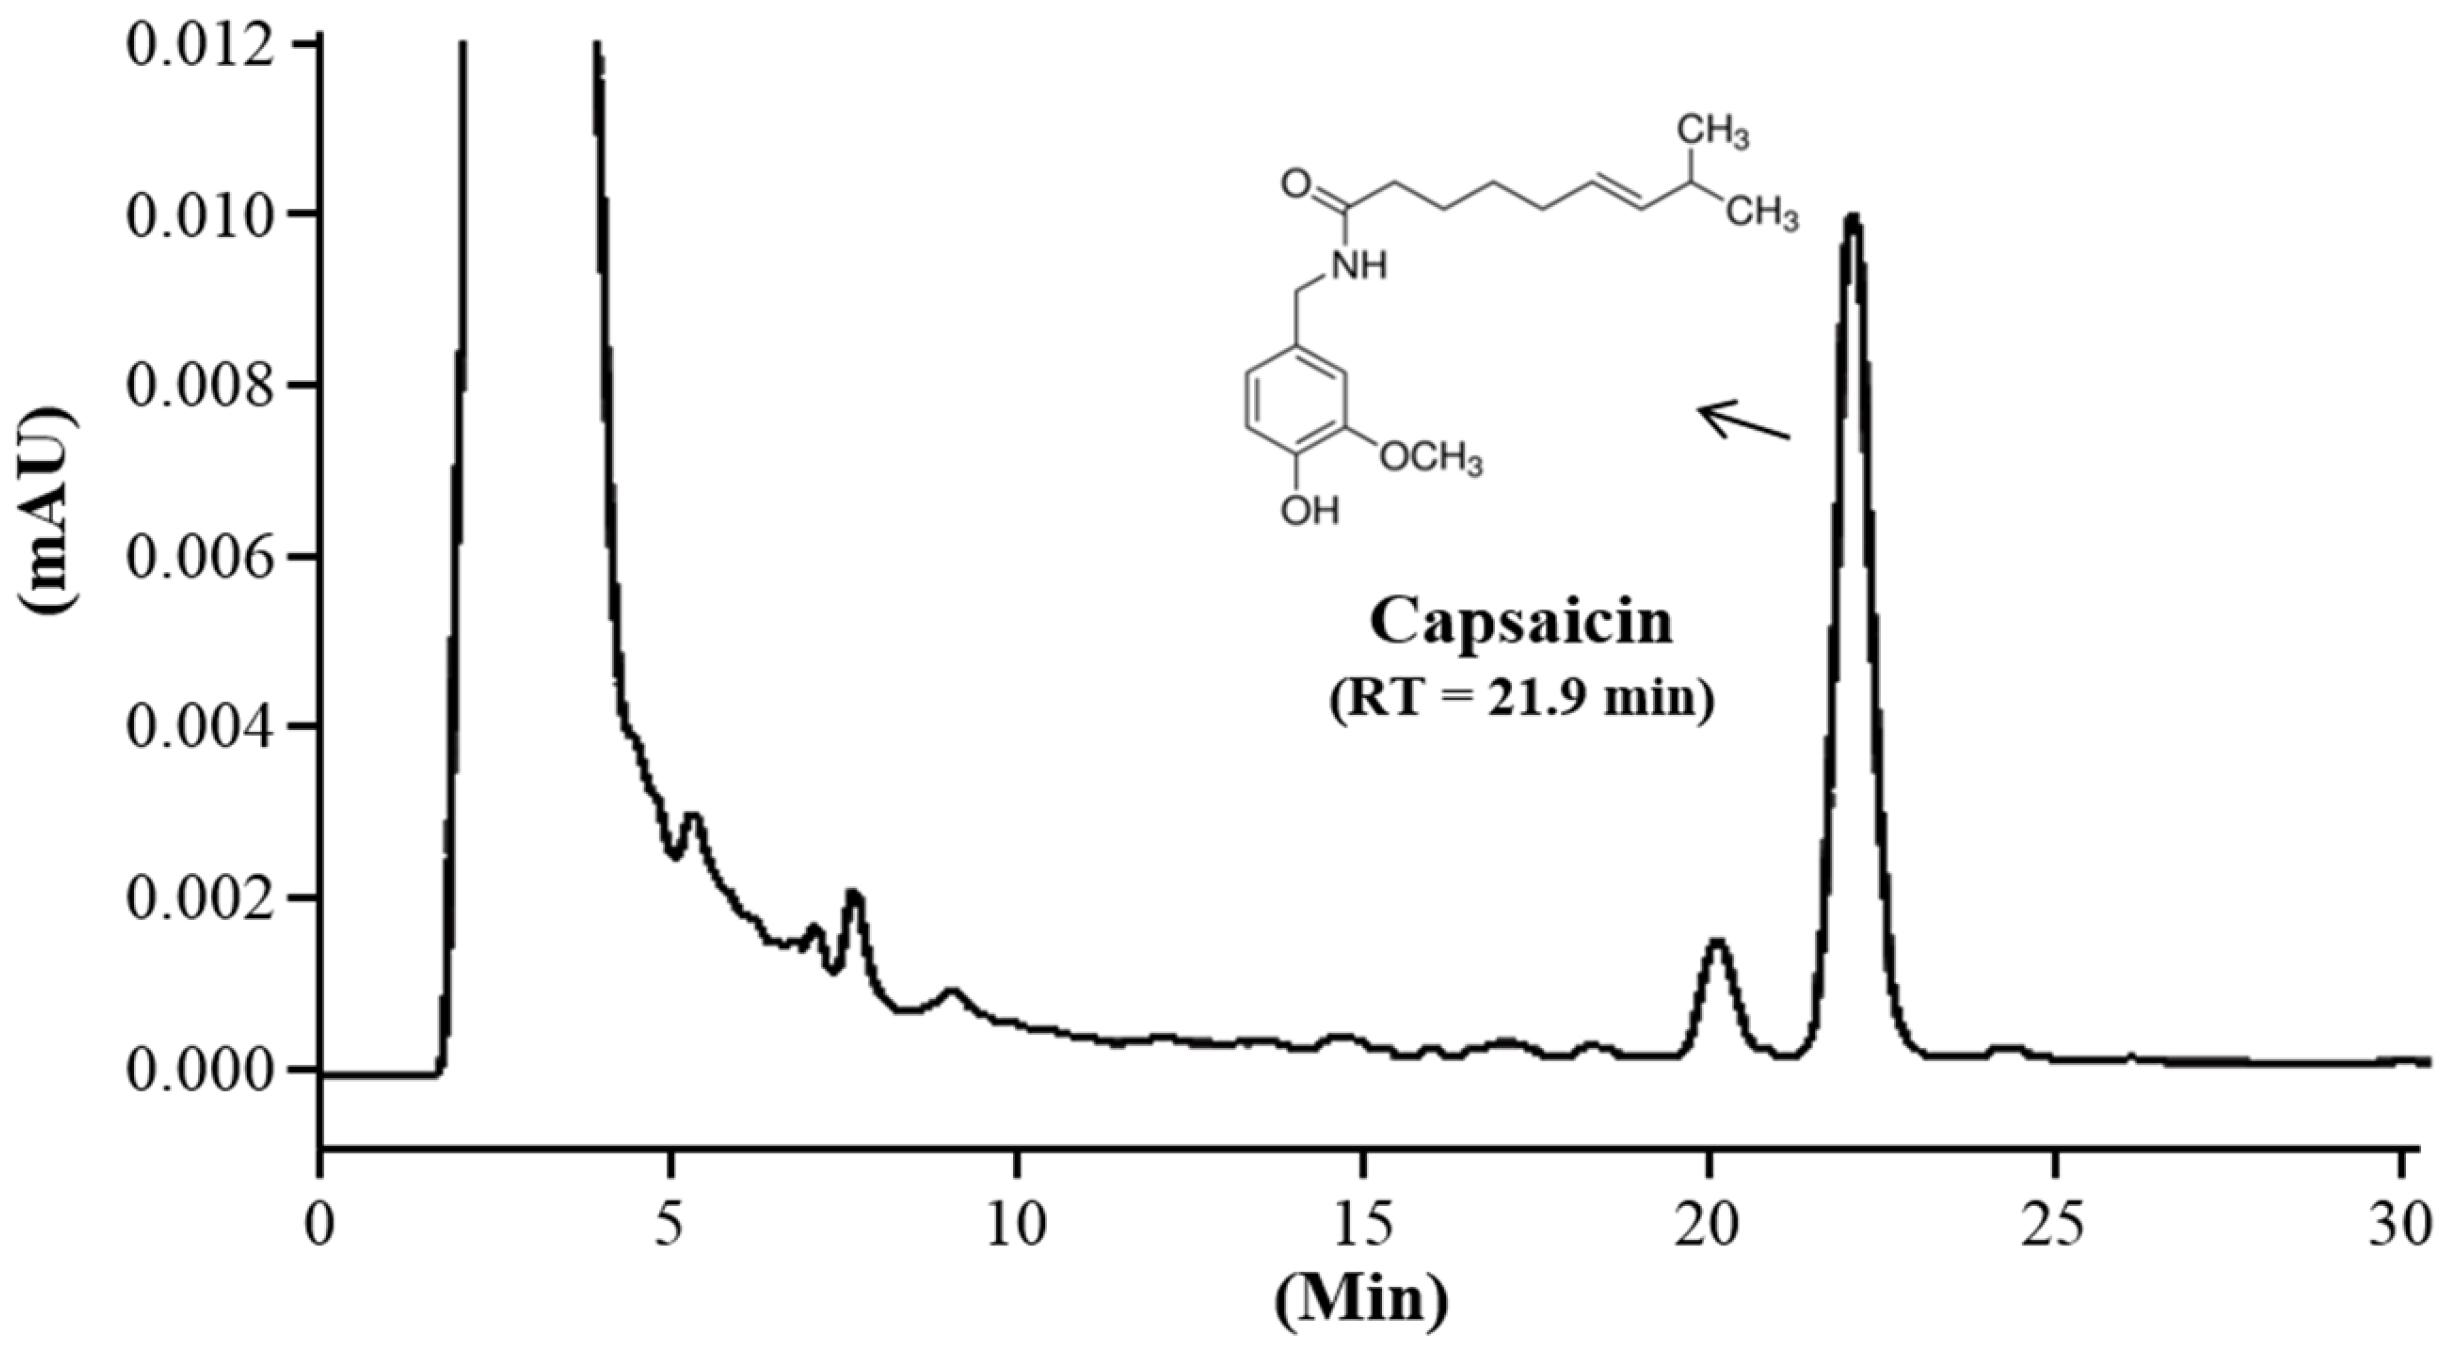 hplc analysis of capsaicin Using reversed-phase high performance liquid chromatography by john kailemia muchena mass spectroscopic analysis showed the presence of 69% capsaicin (m/z.